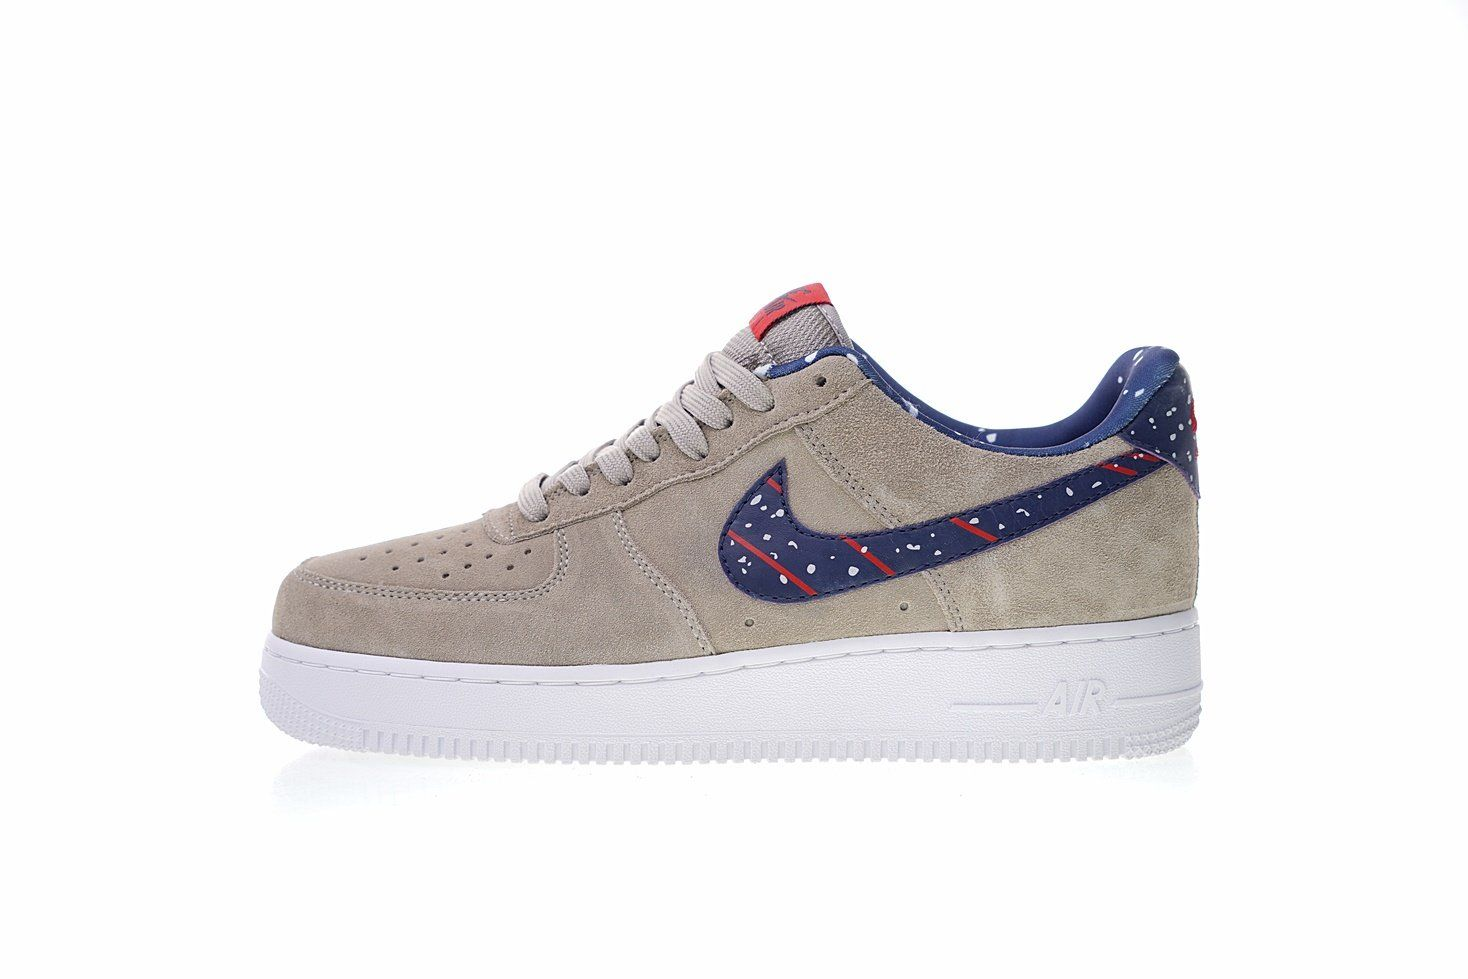 837be5048d2b0 Nike Air Force 1